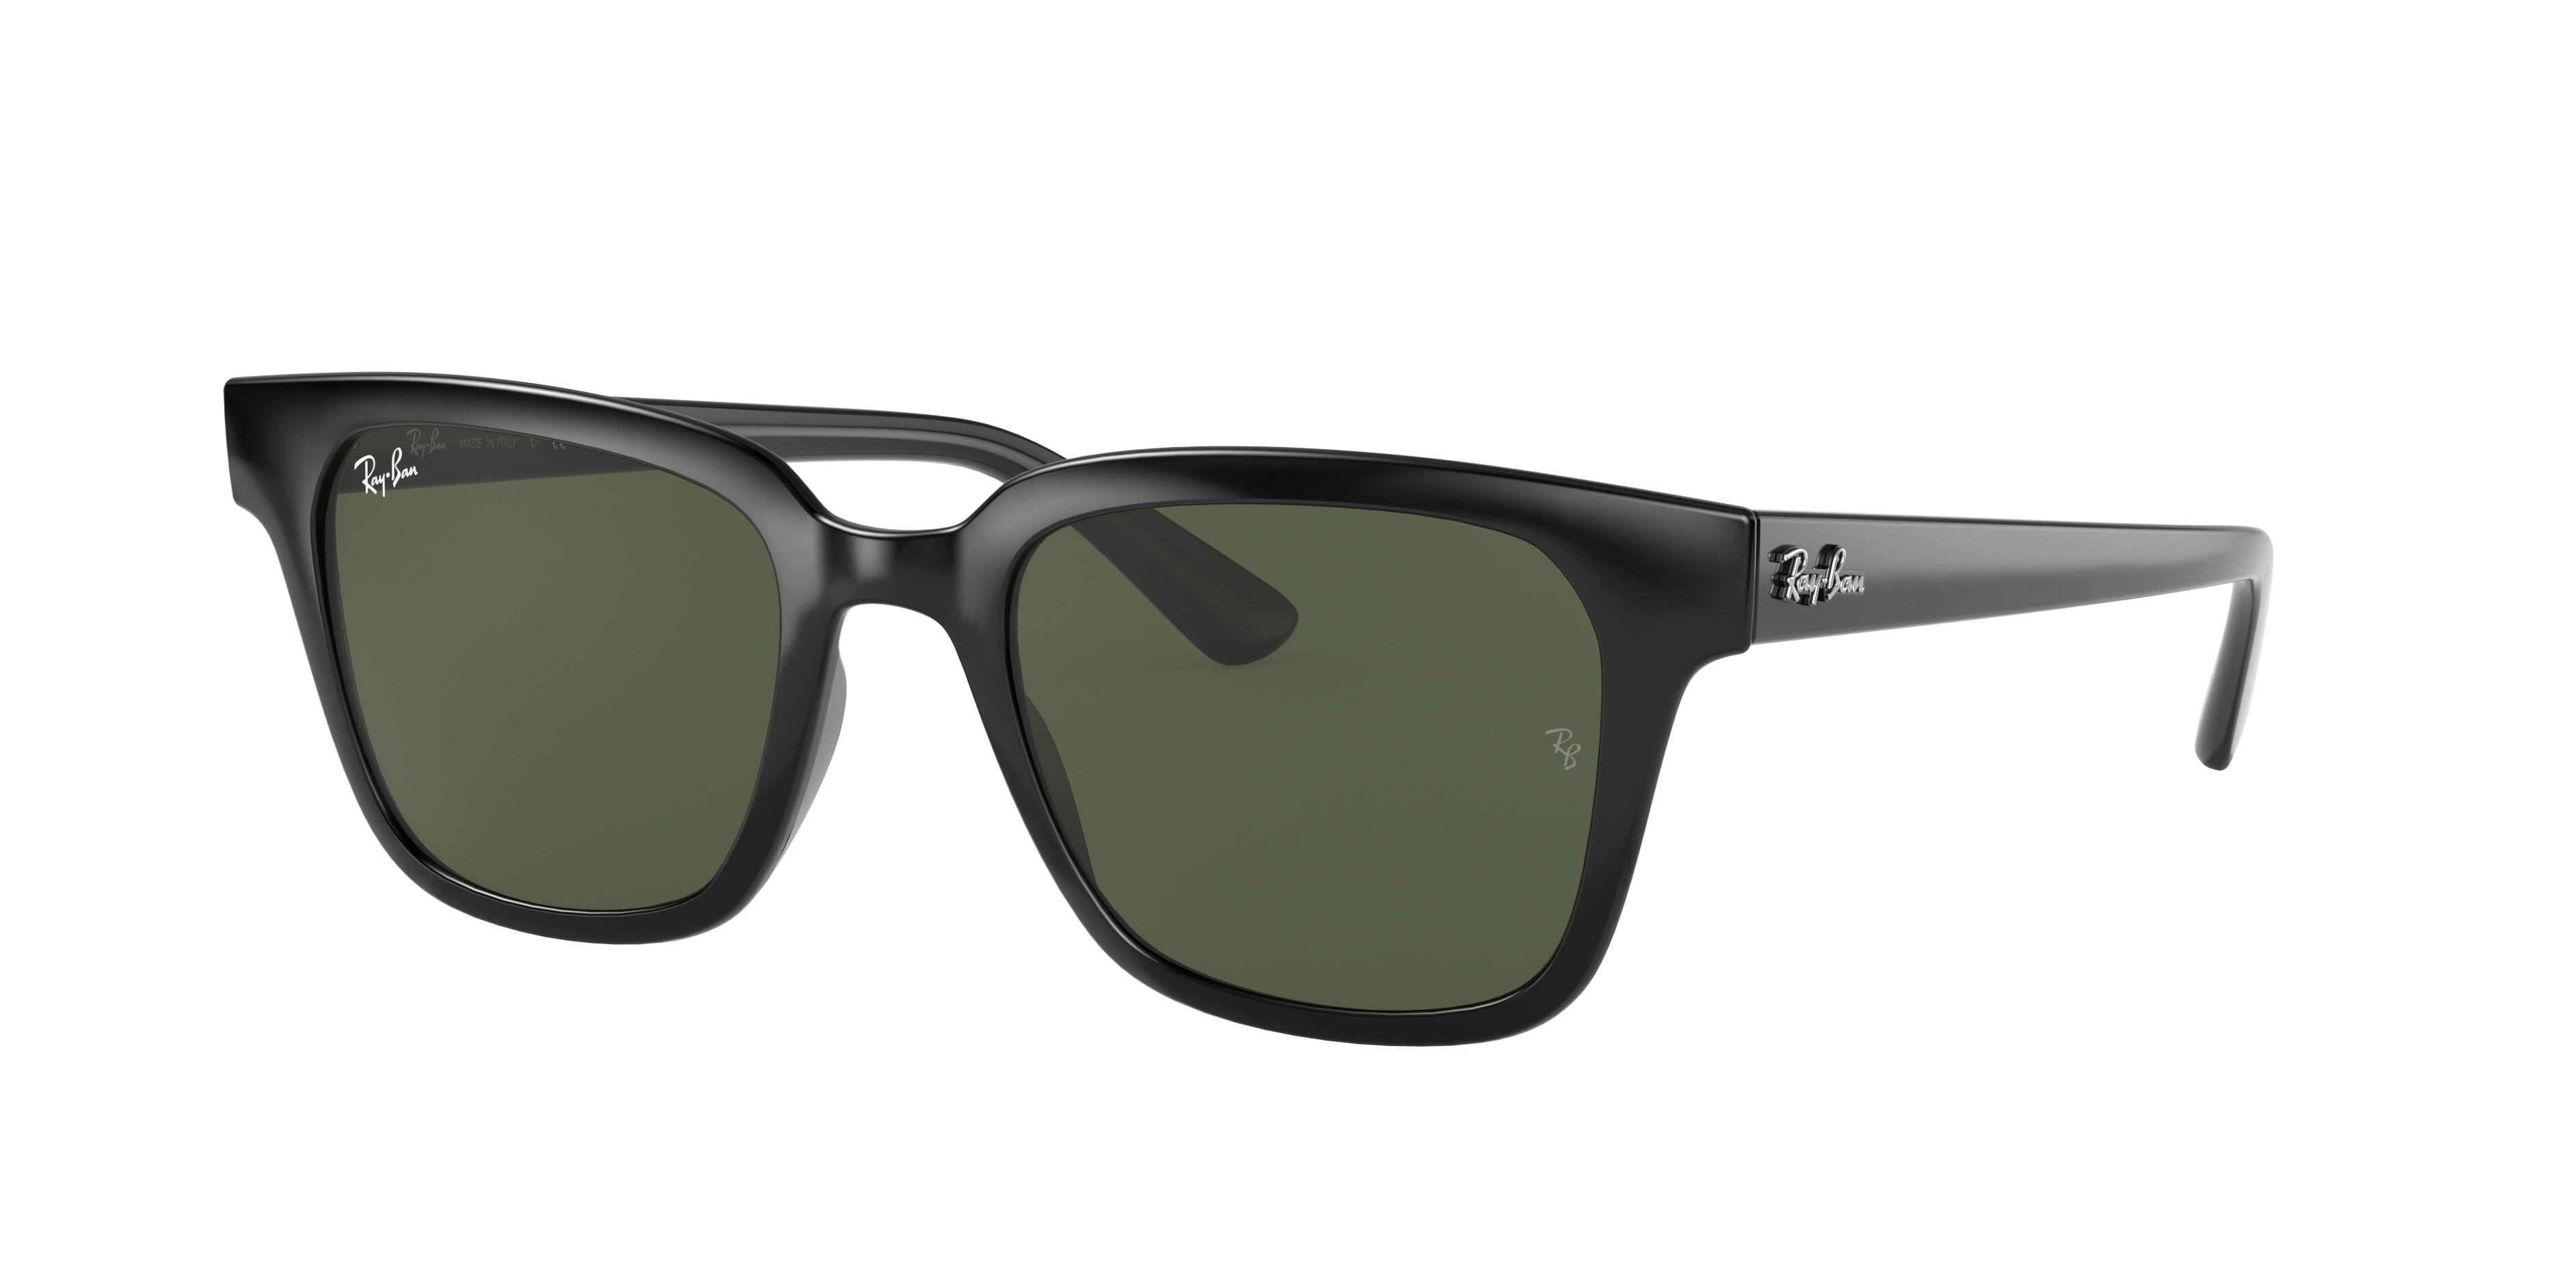 Ray-Ban Rb4323 Low Bridge Fit Black, Green Lenses - RB4323F